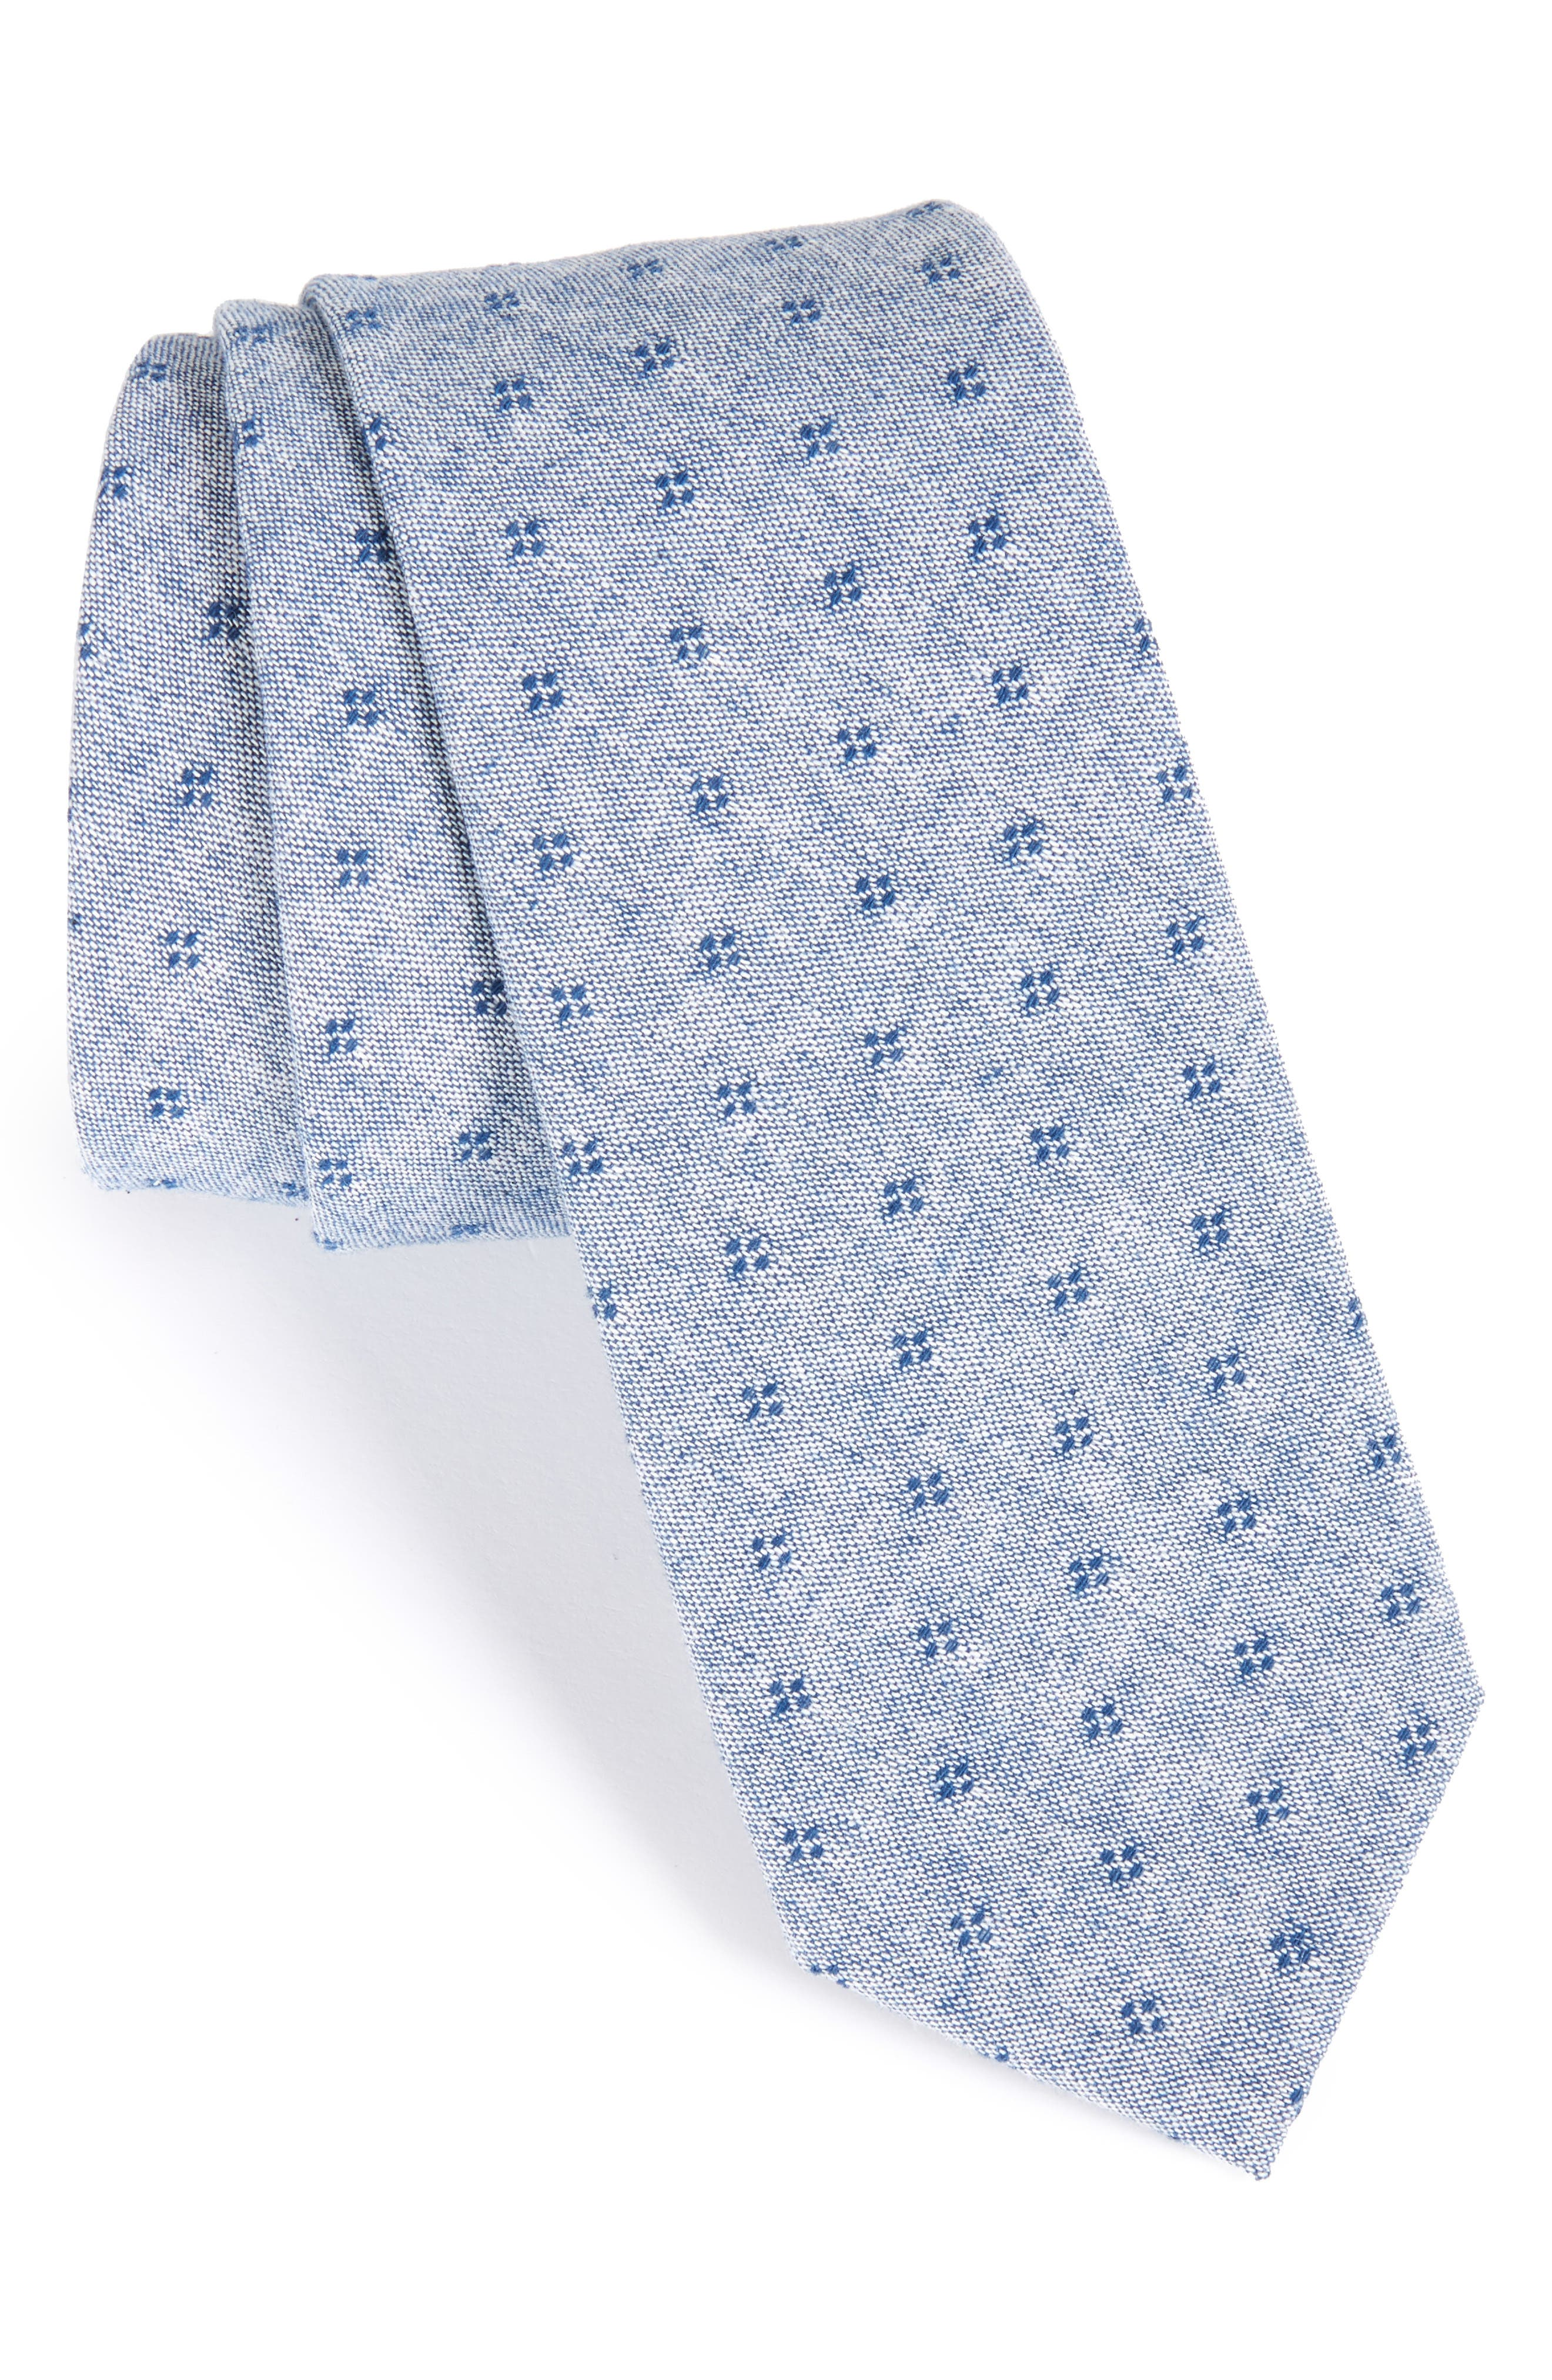 Dot Cotton Skinny Tie,                         Main,                         color, Navy